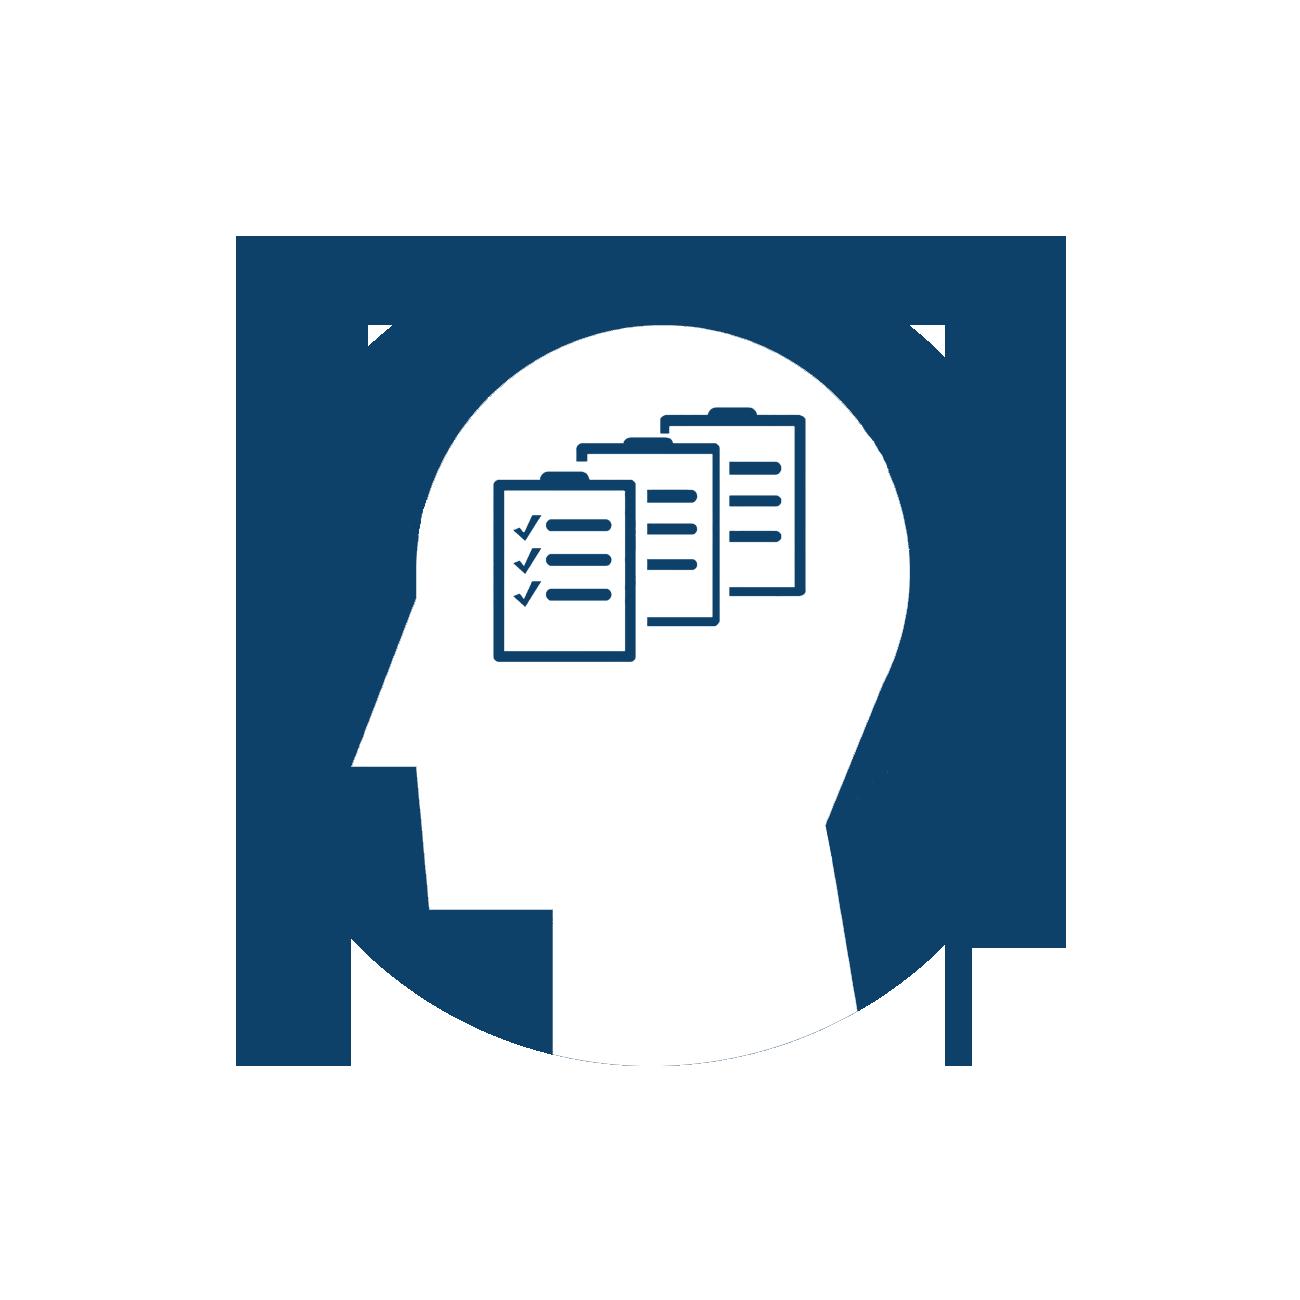 Valutazione Psicologica - Studio Anthos